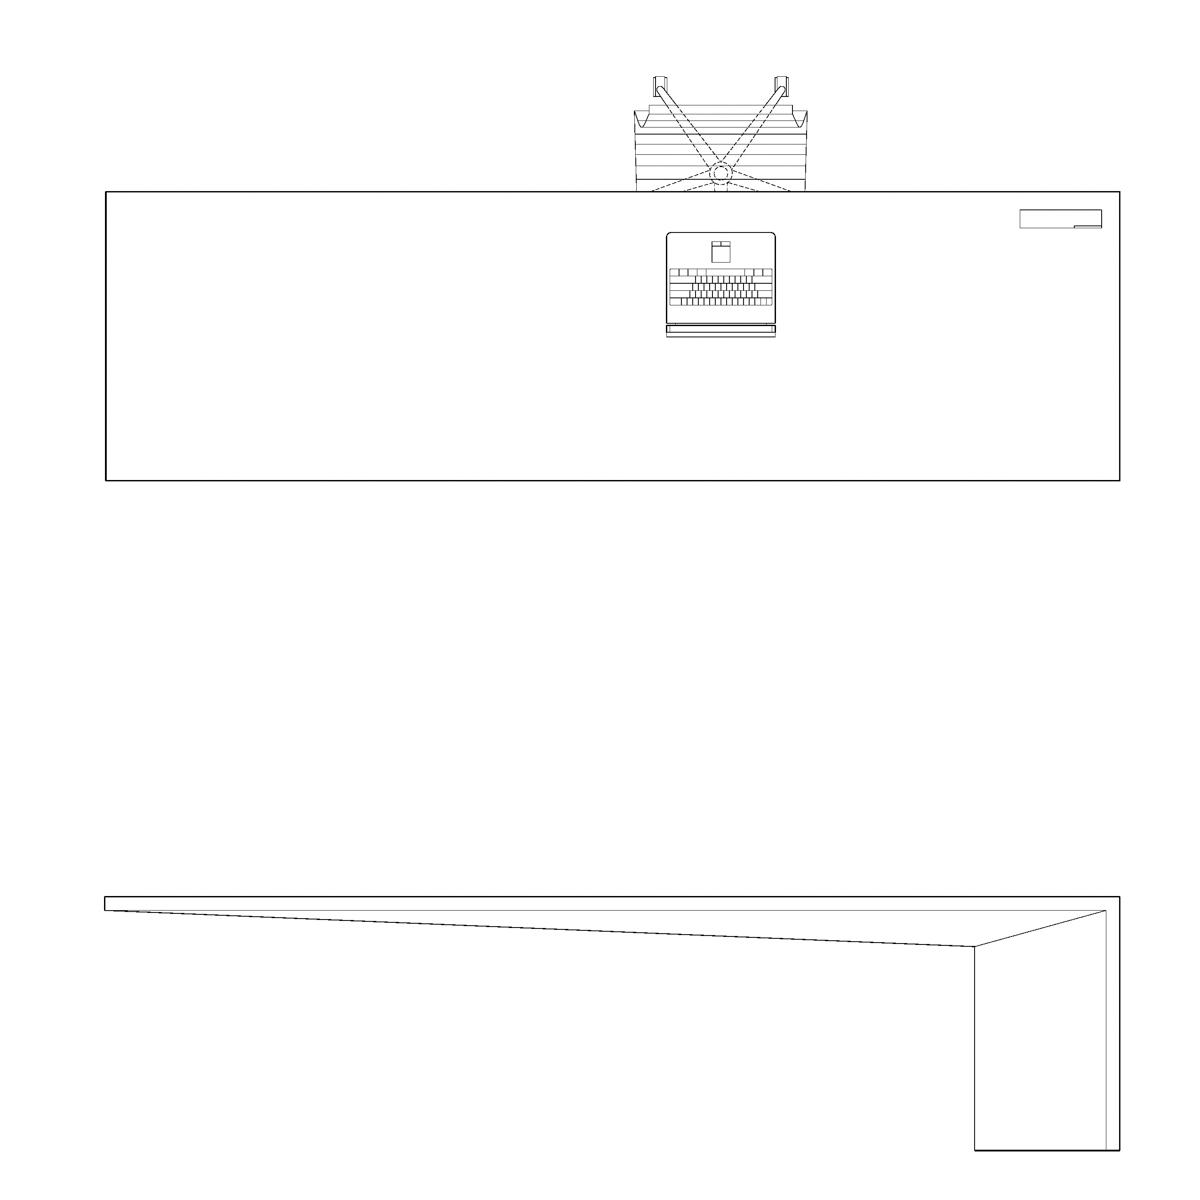 drawing-8.jpg